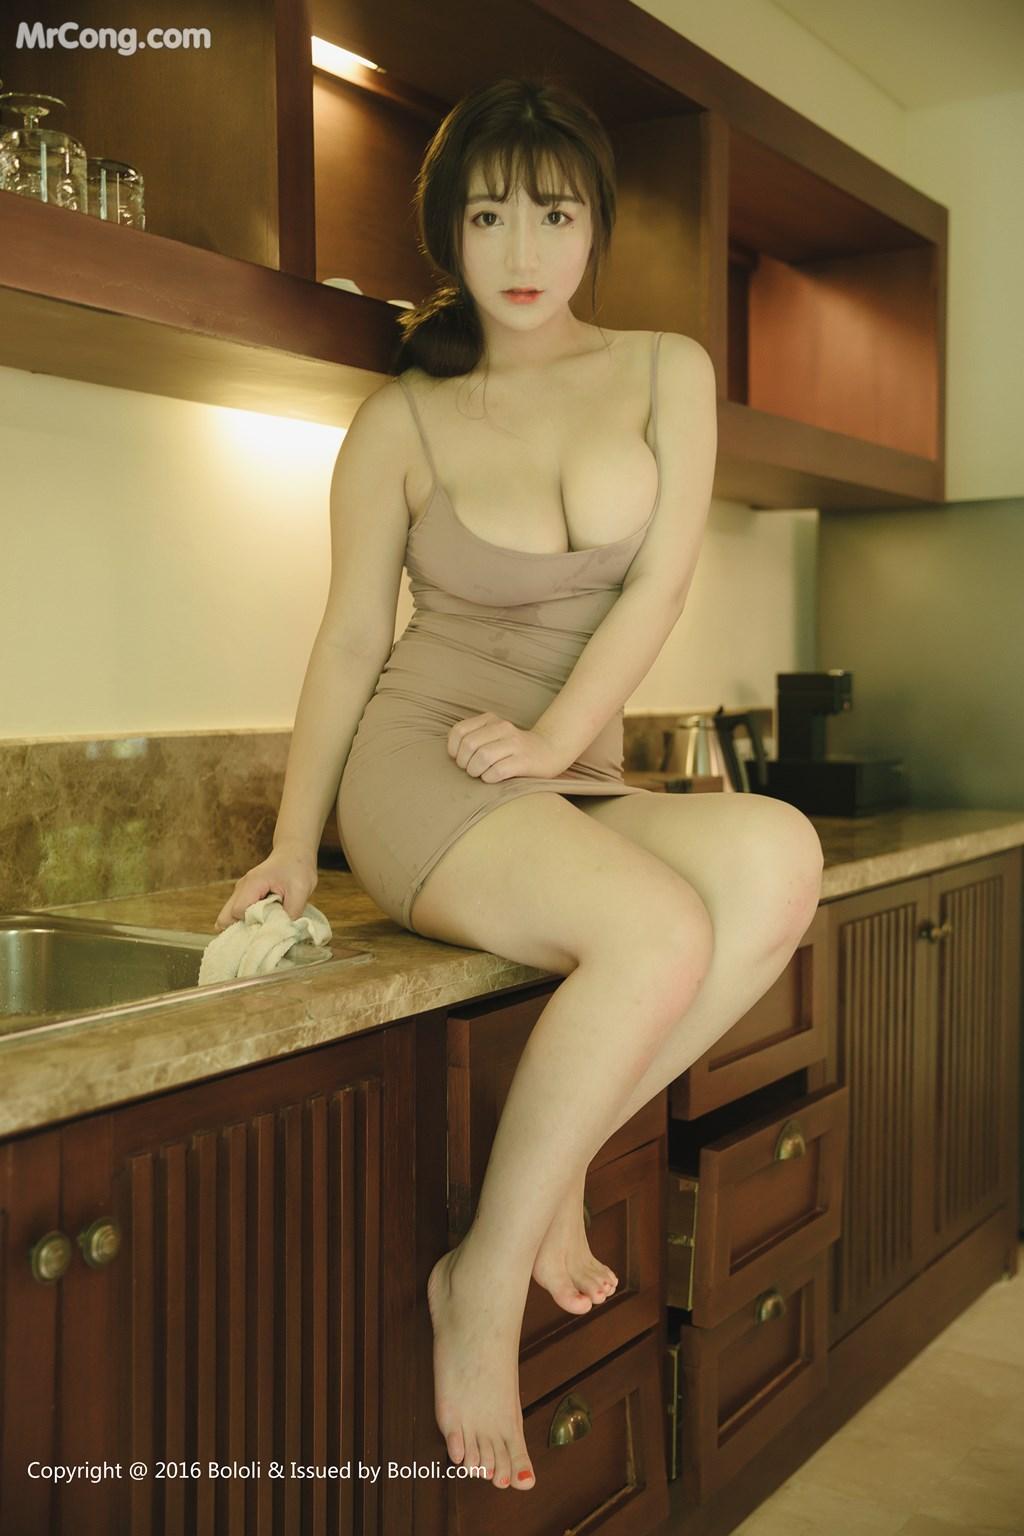 Image Tukmo-Vol.114-Mang-Guo-milk-MrCong.com-010 in post Tukmo Vol.114: Người mẫu Mang Guo (芒果milk) (40 ảnh)